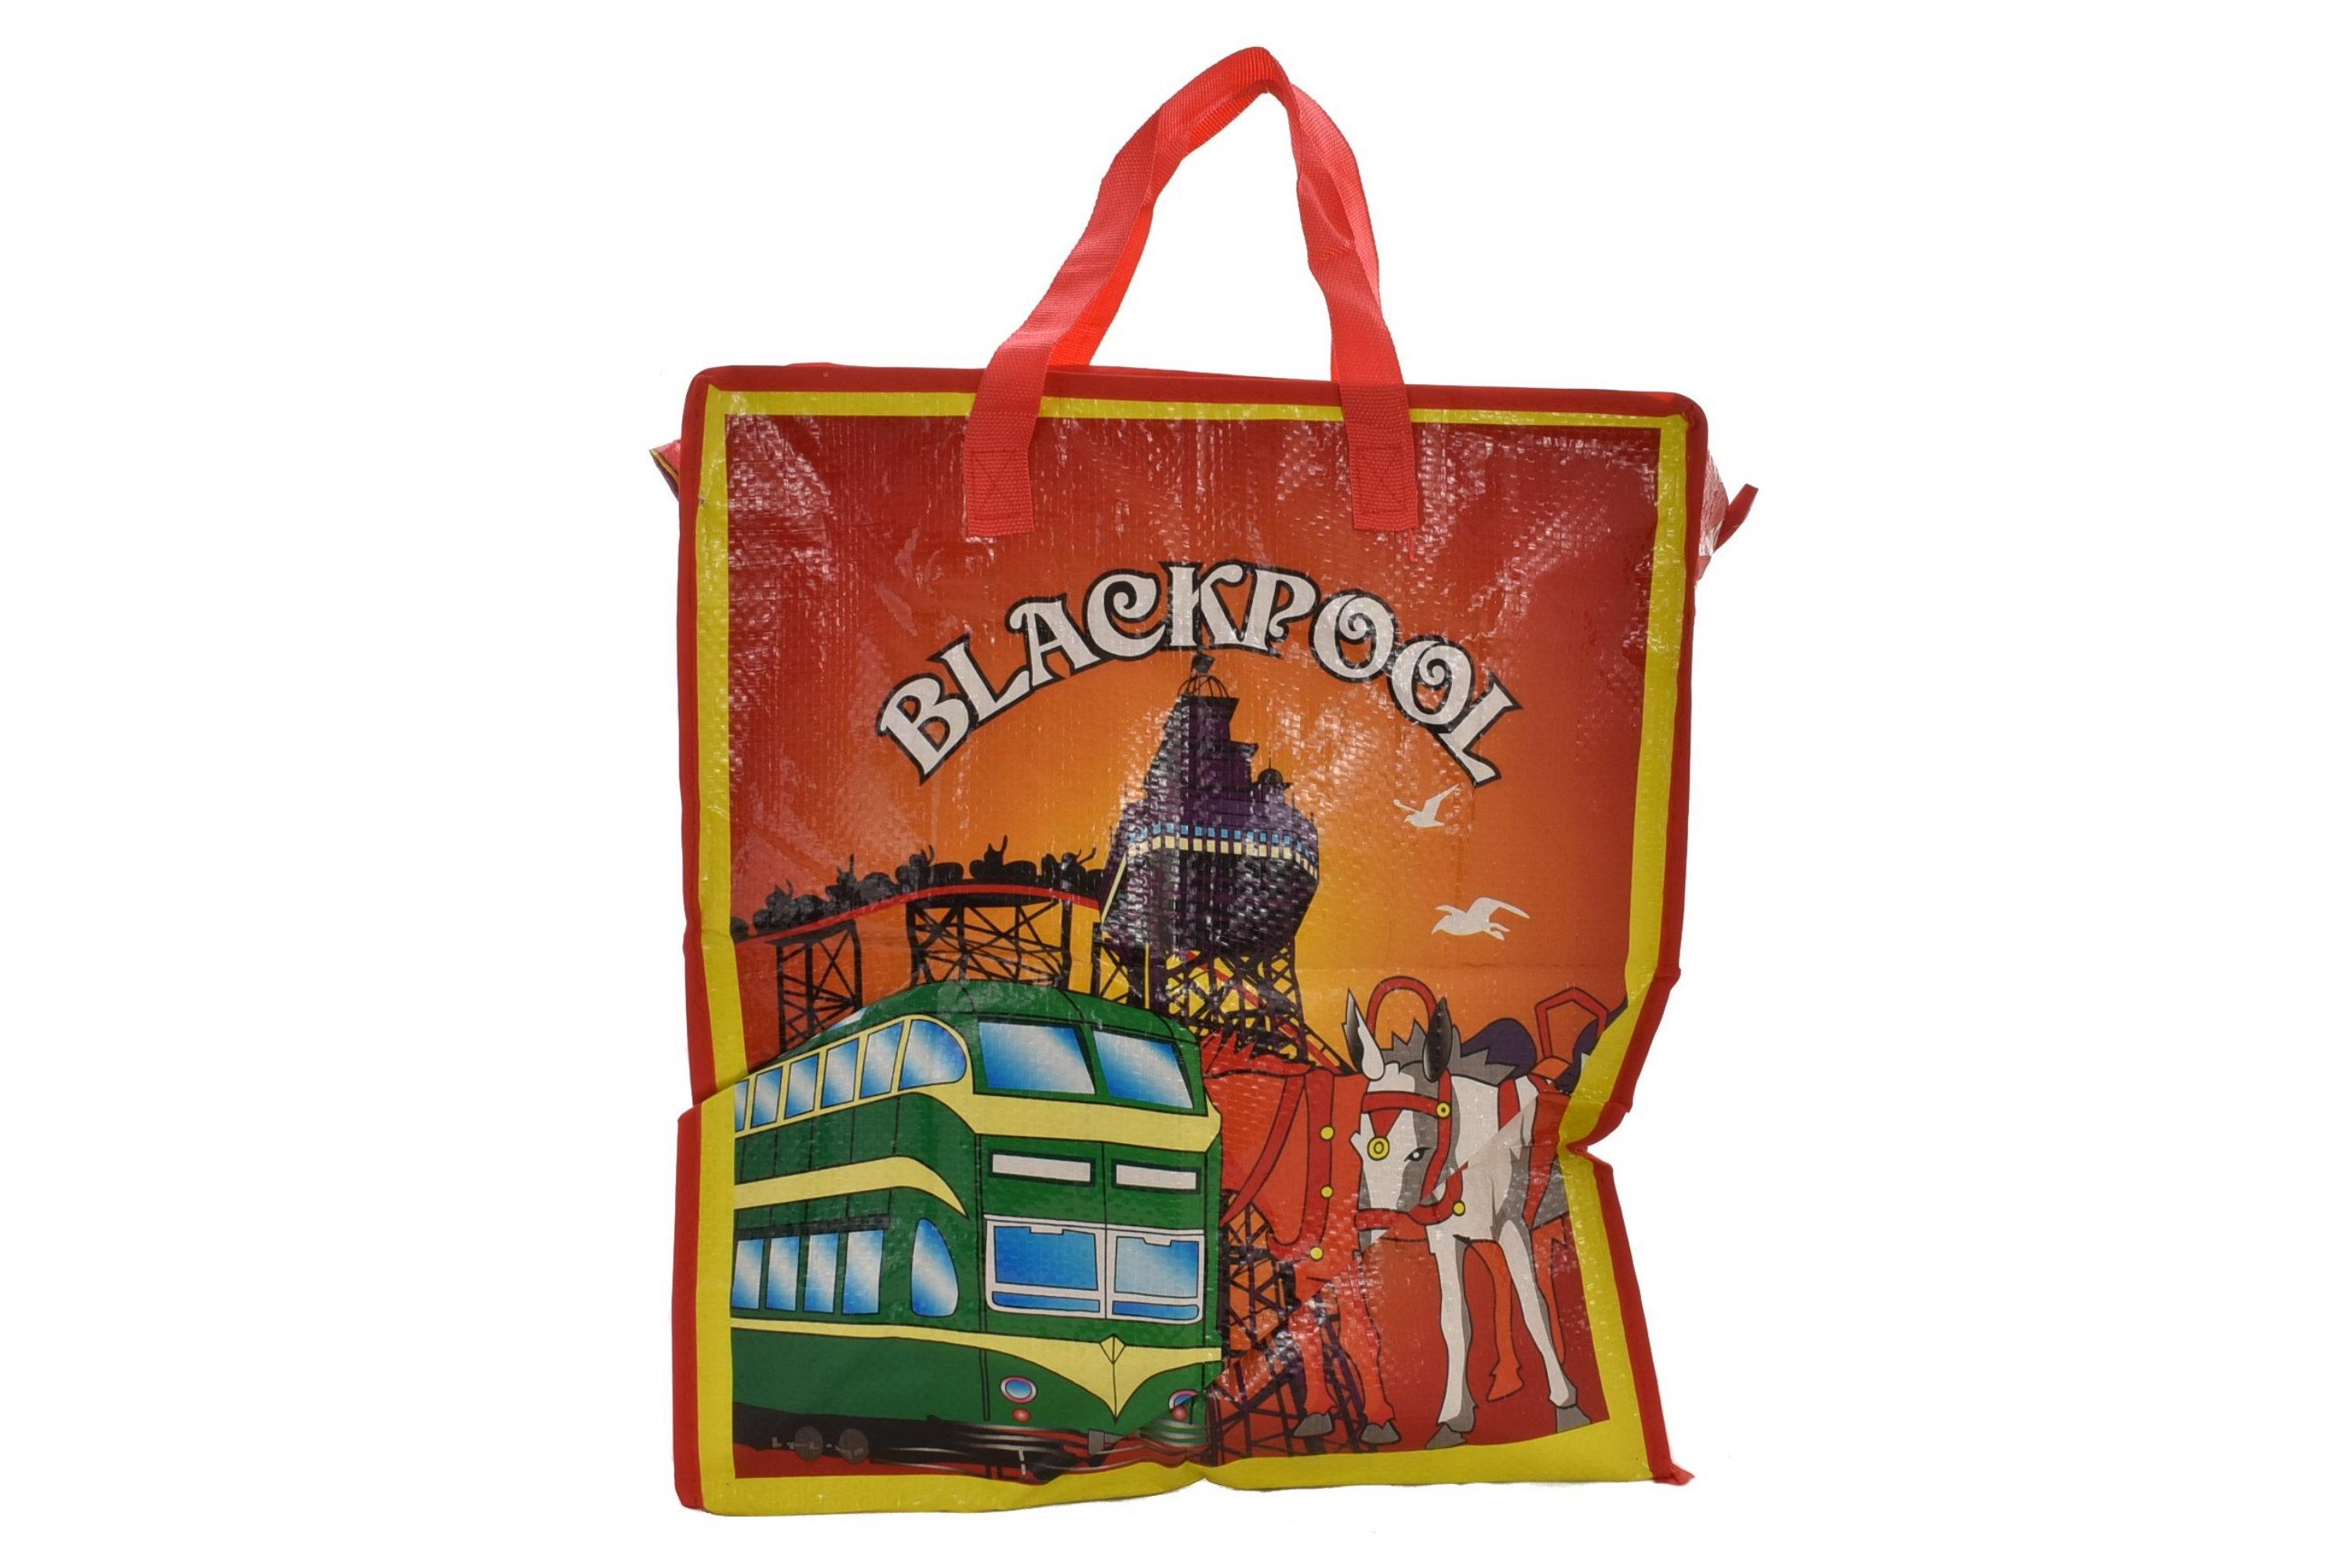 Blackpool Shopping Bag Day Design 41x47cm